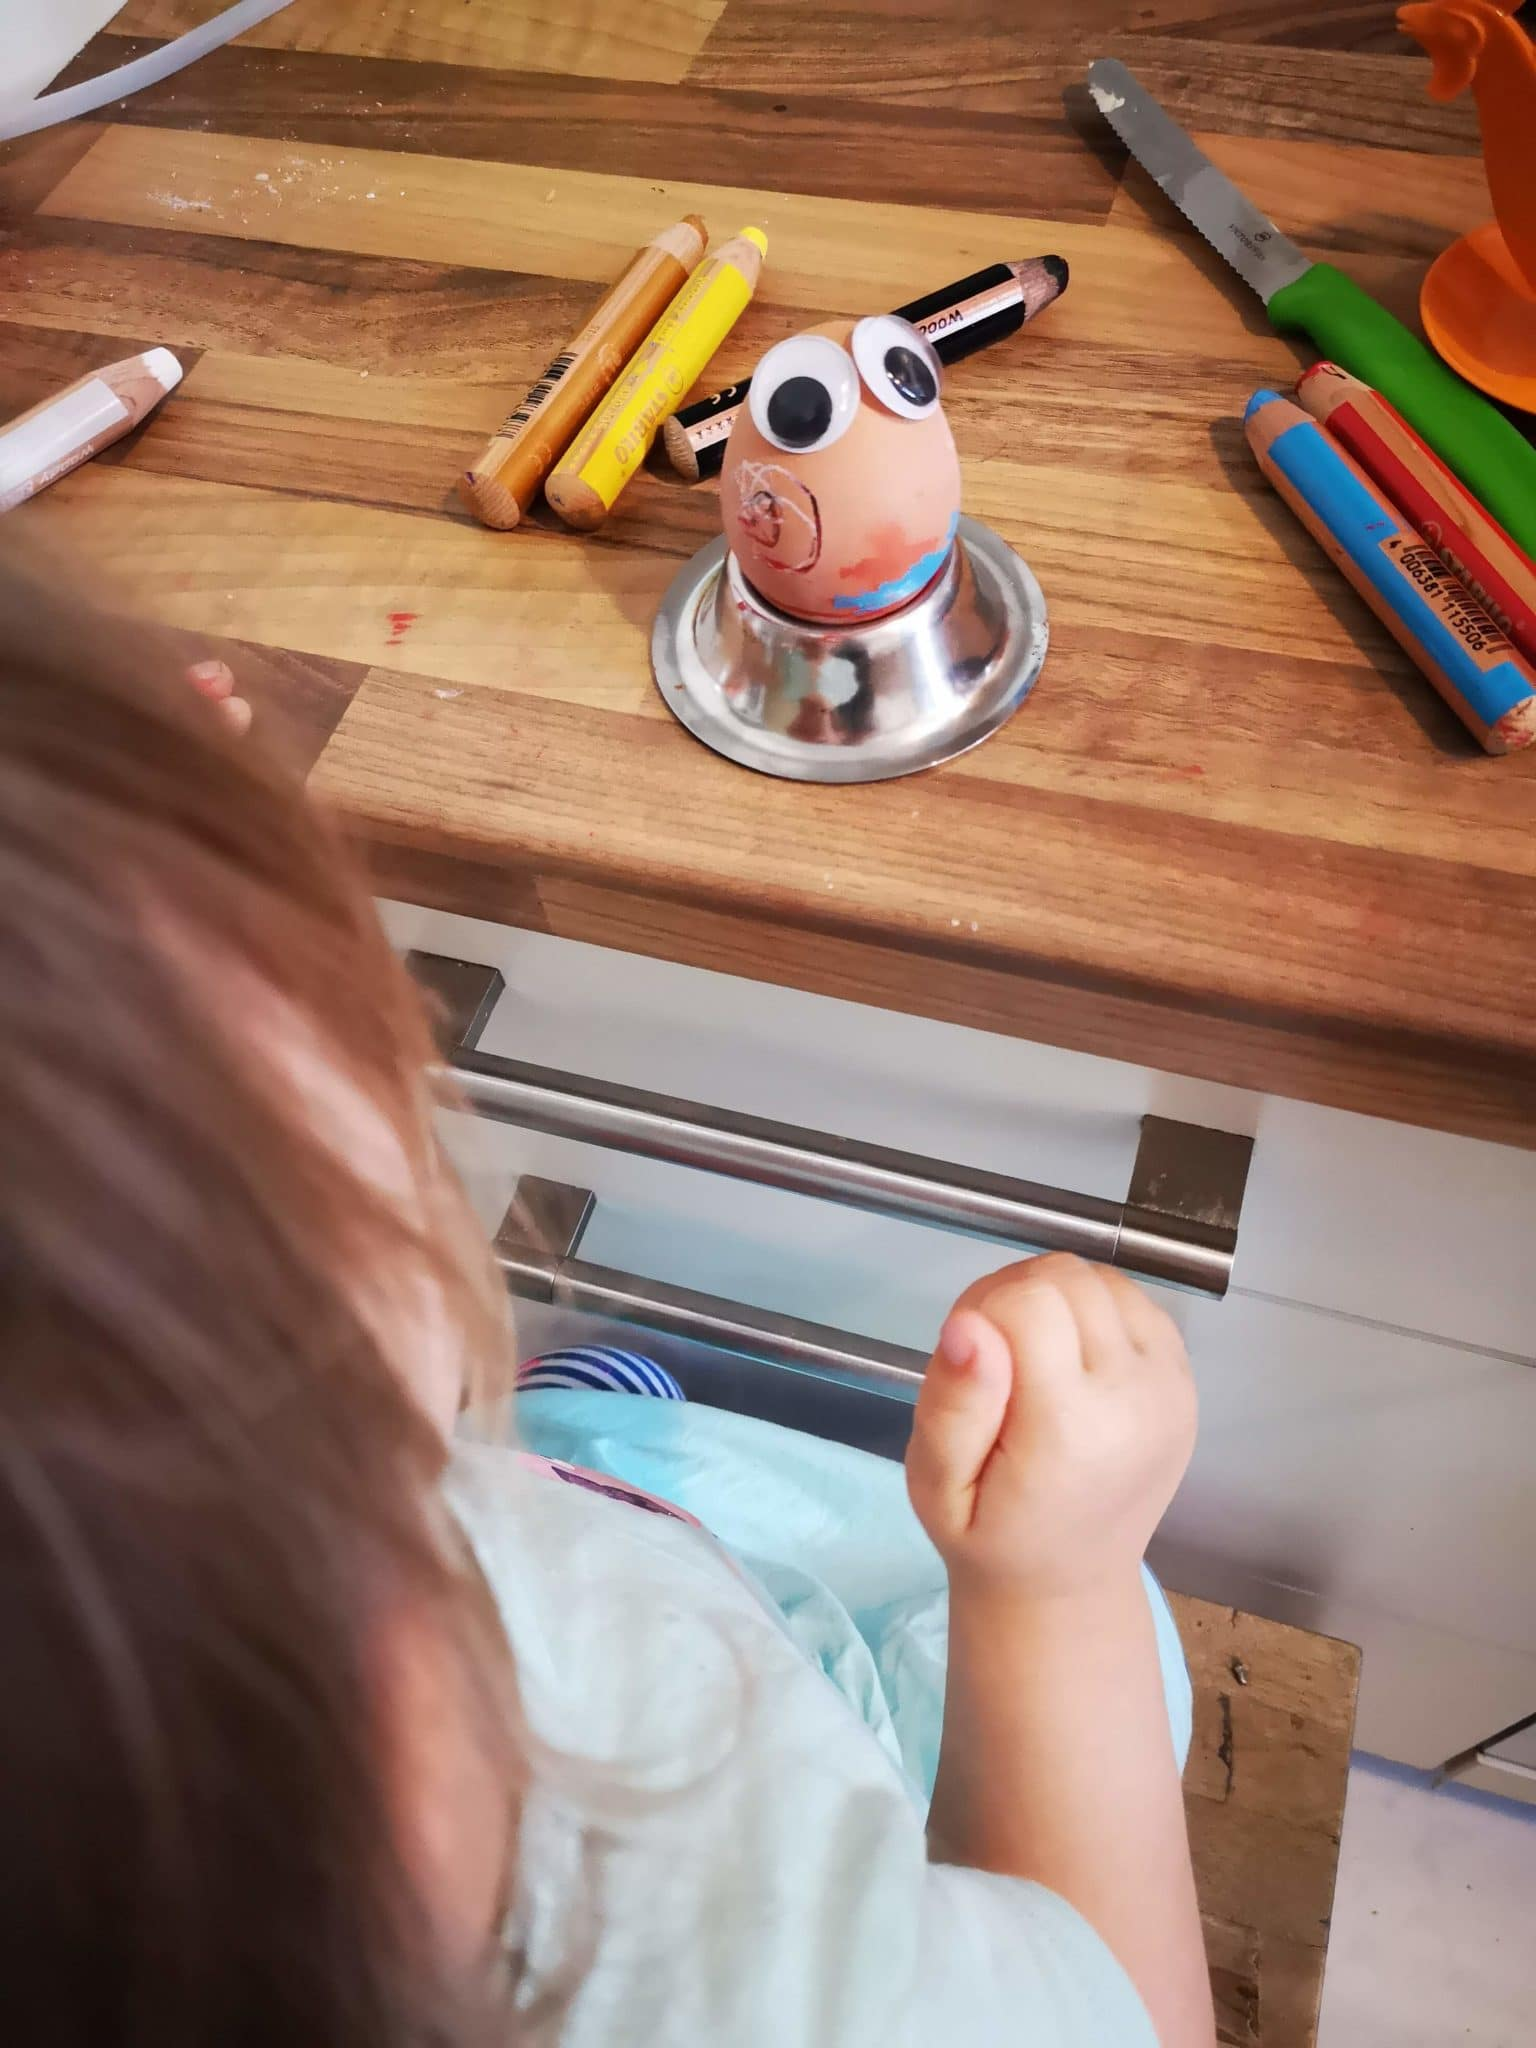 Elternblog_Alltag_grossekoepfe.de